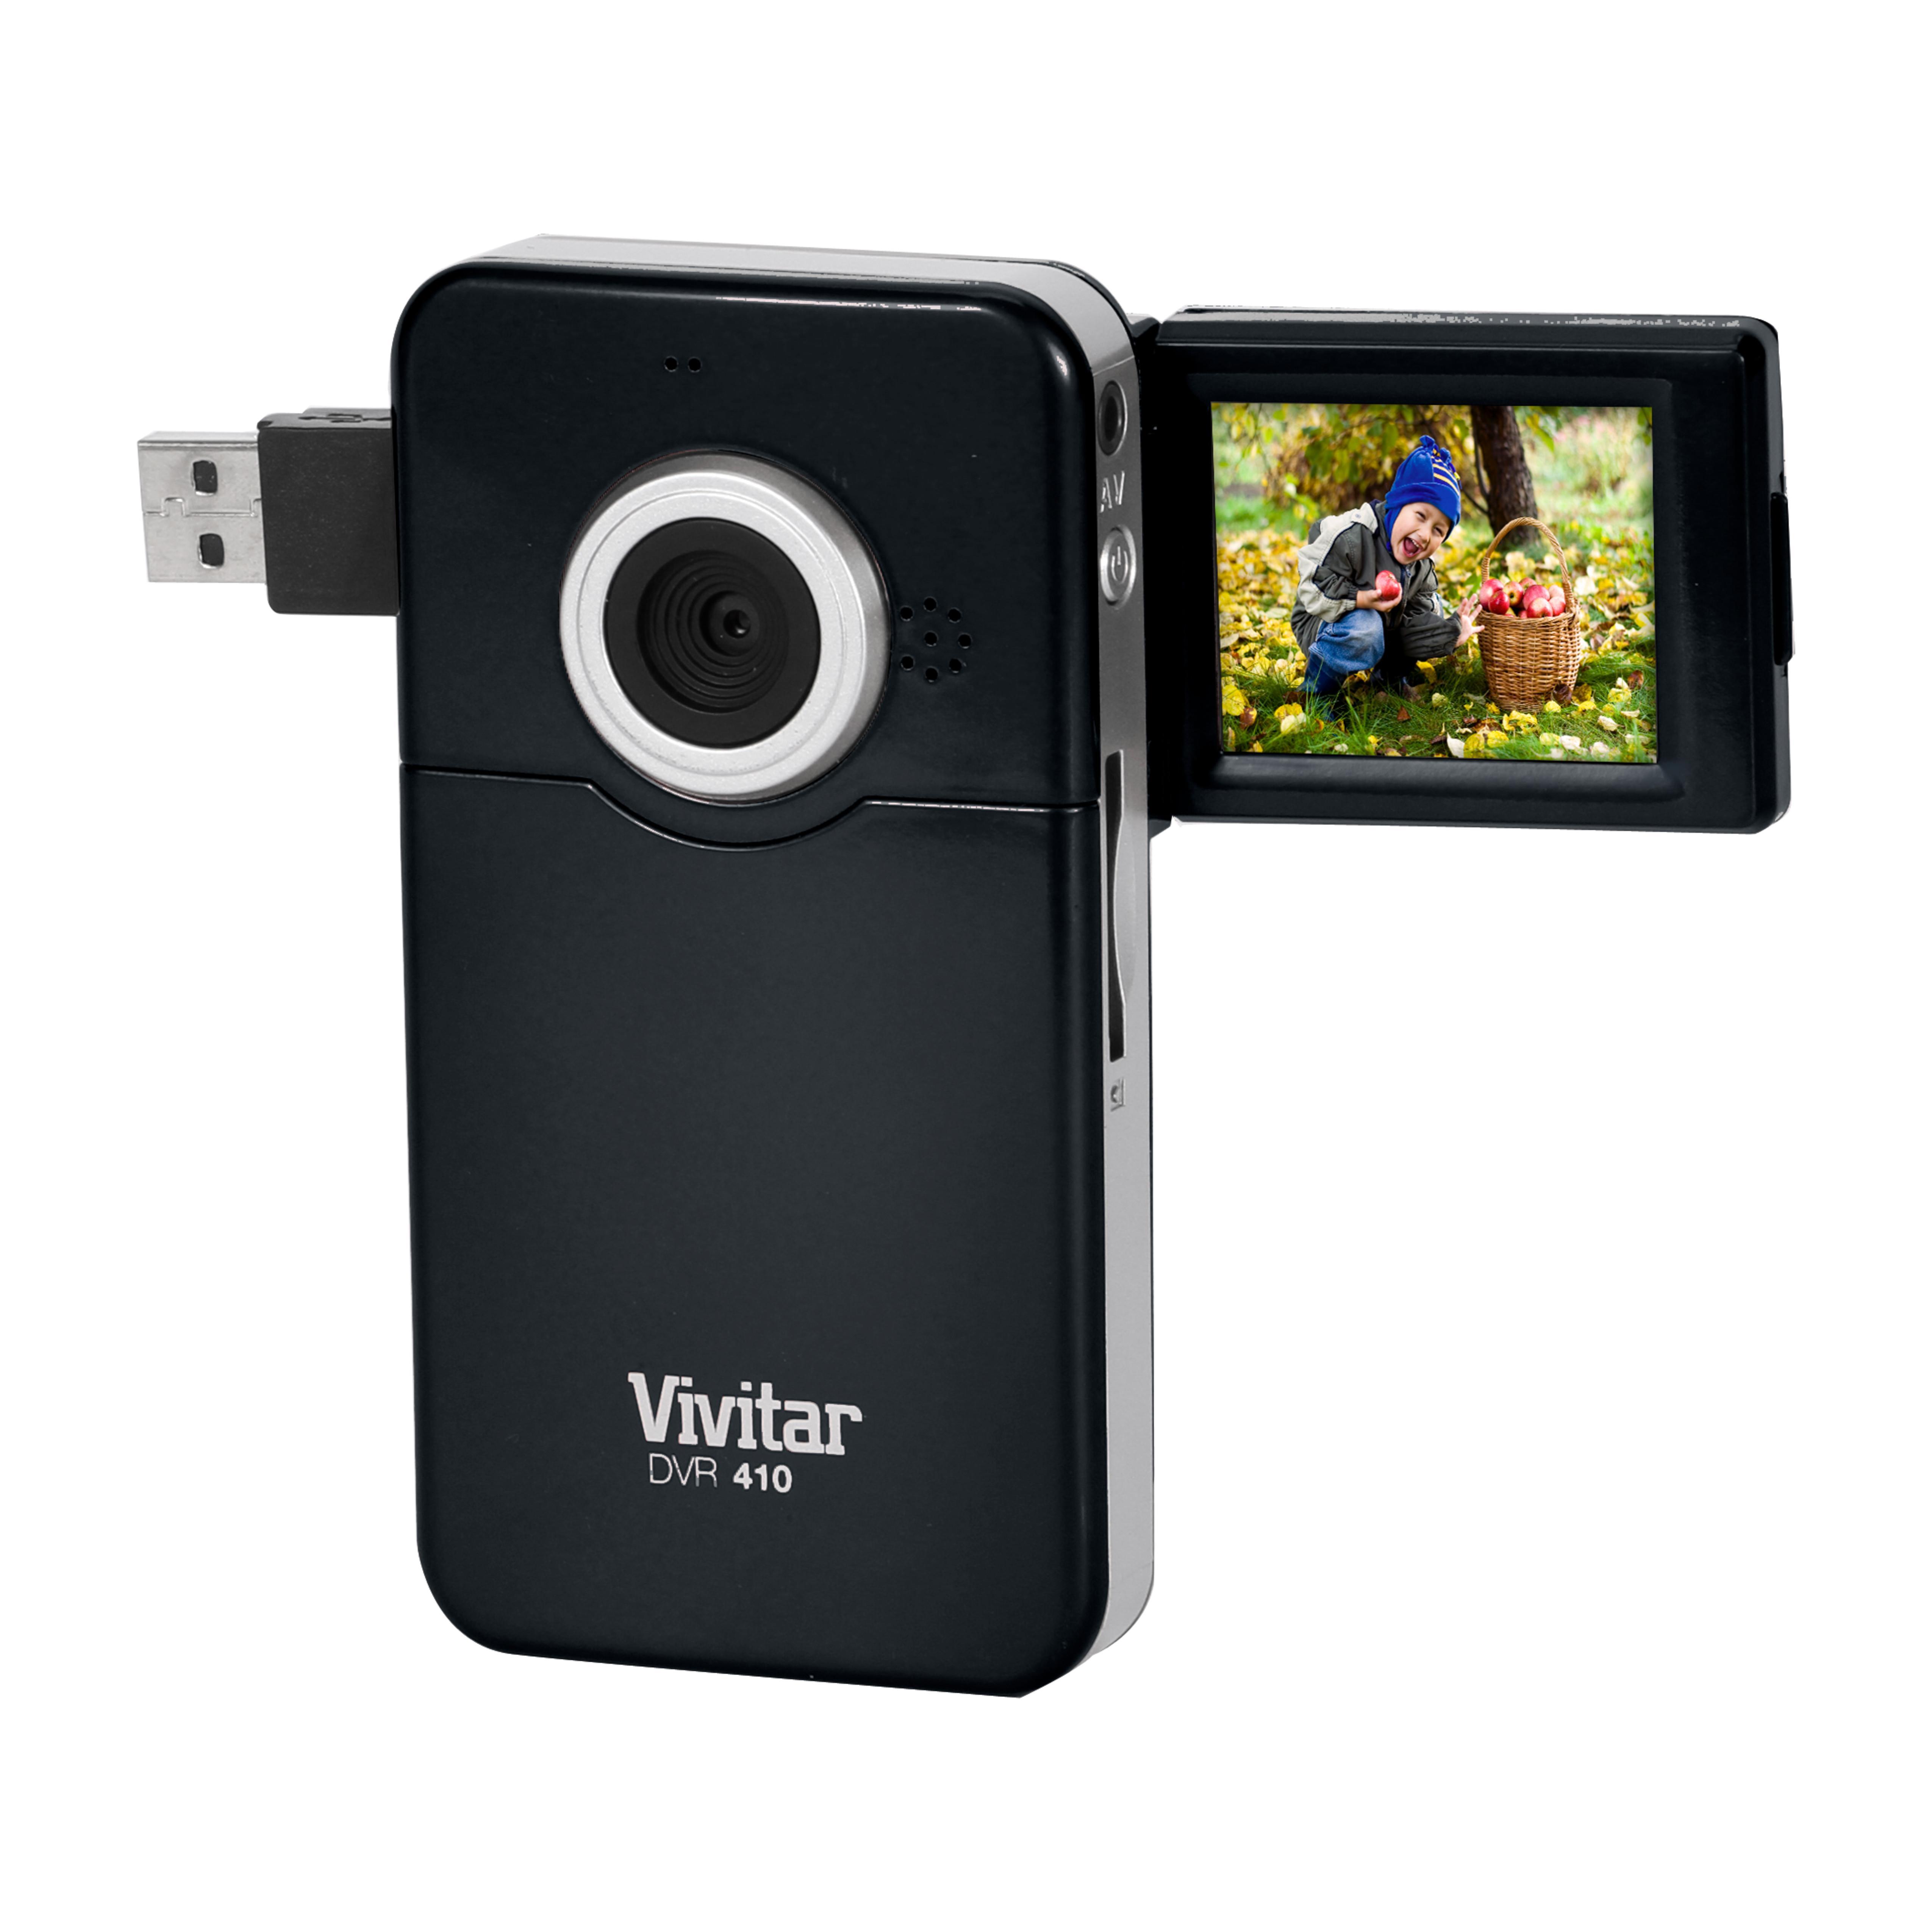 vivitar 410 8 1mp 720p high definition digital video camera camera photo. Black Bedroom Furniture Sets. Home Design Ideas